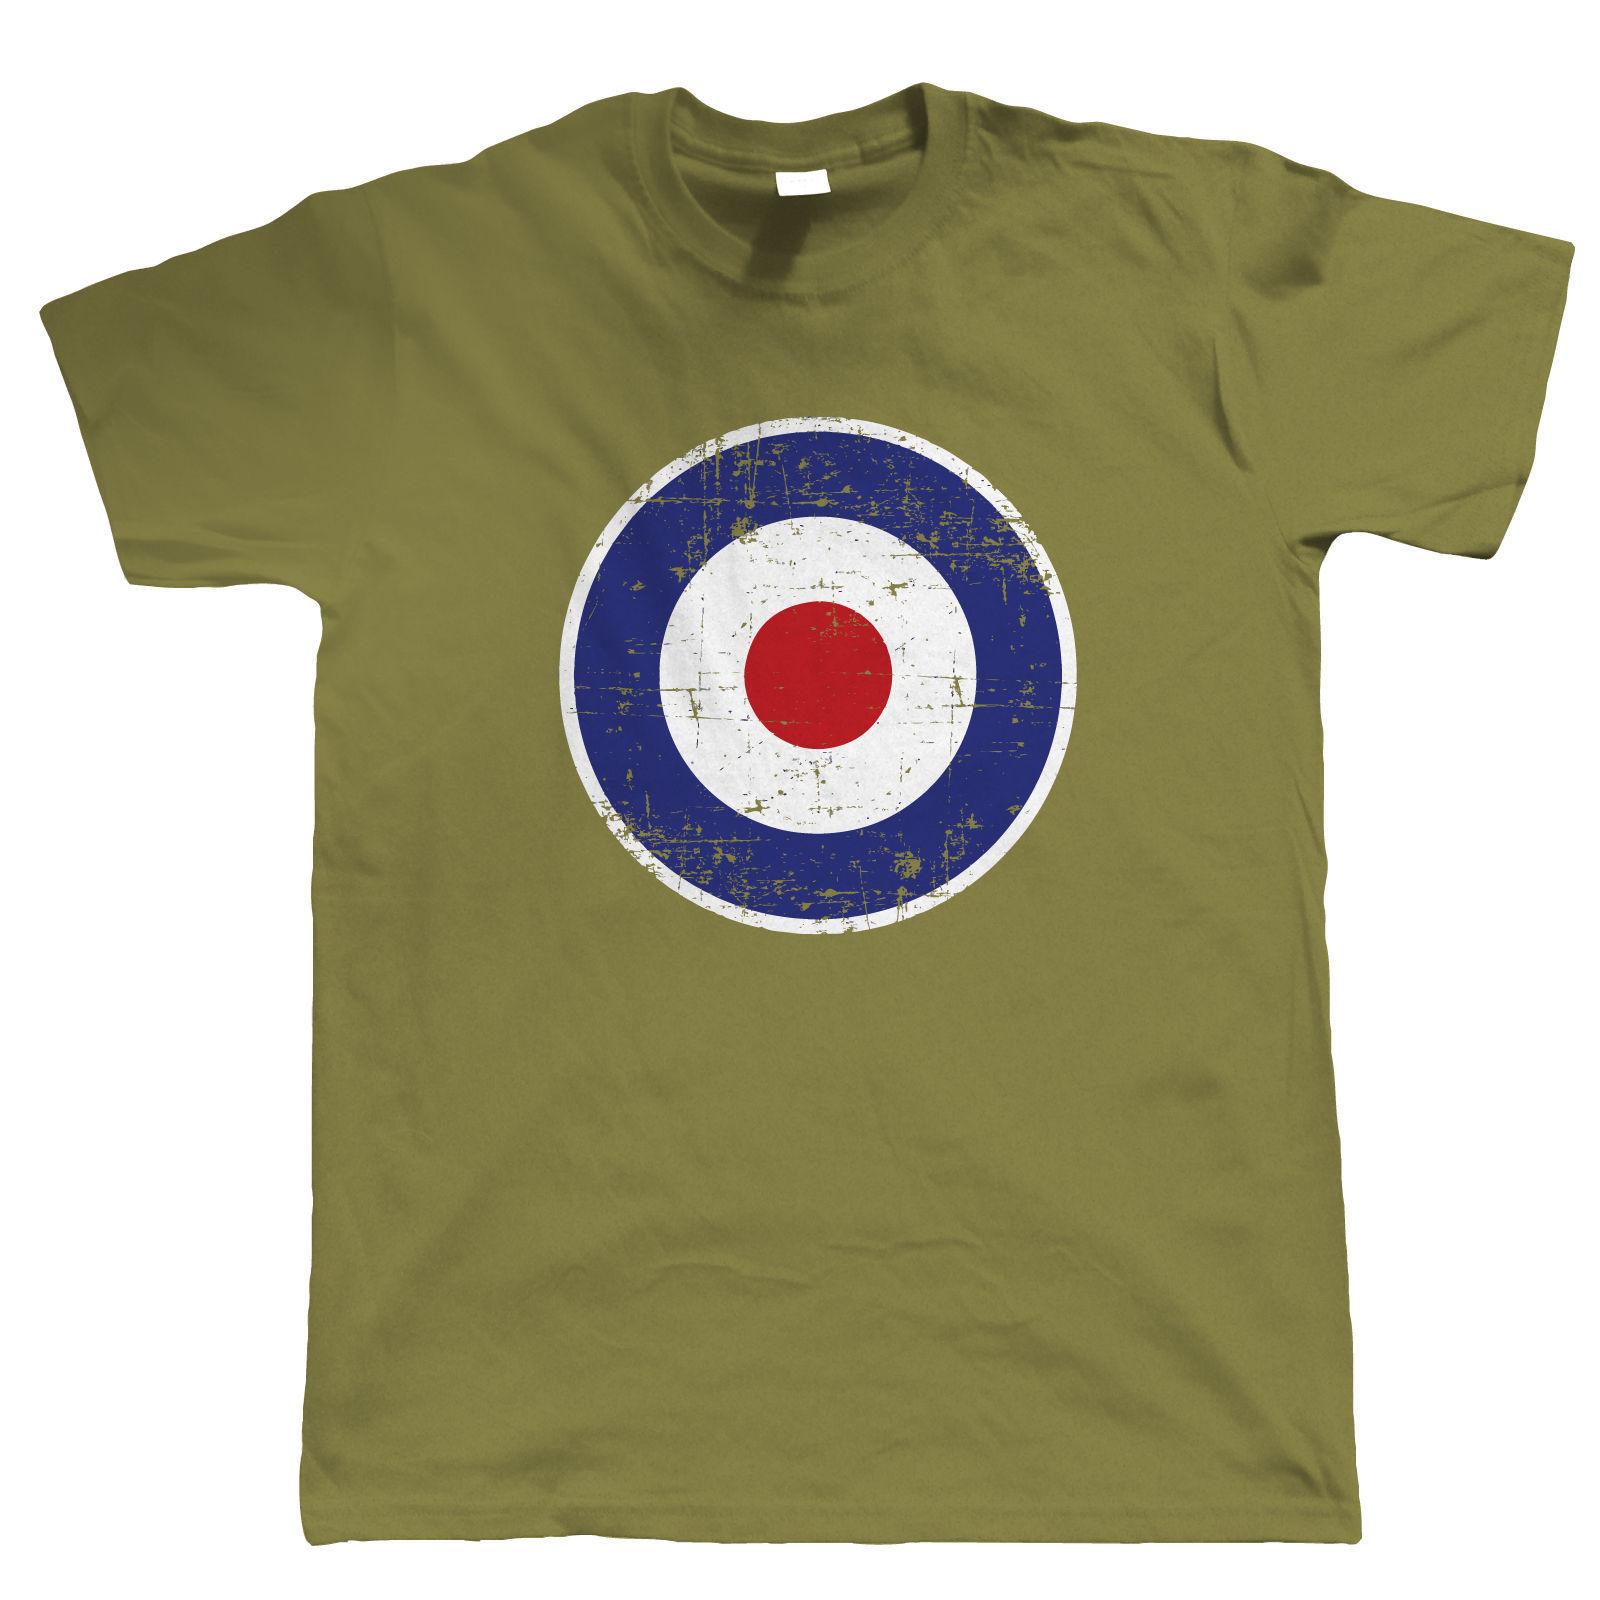 Gran oferta 2019, 100% Retro de algodón, modelo RAF Target, camiseta de Scooter para hombre, regalo para papá él